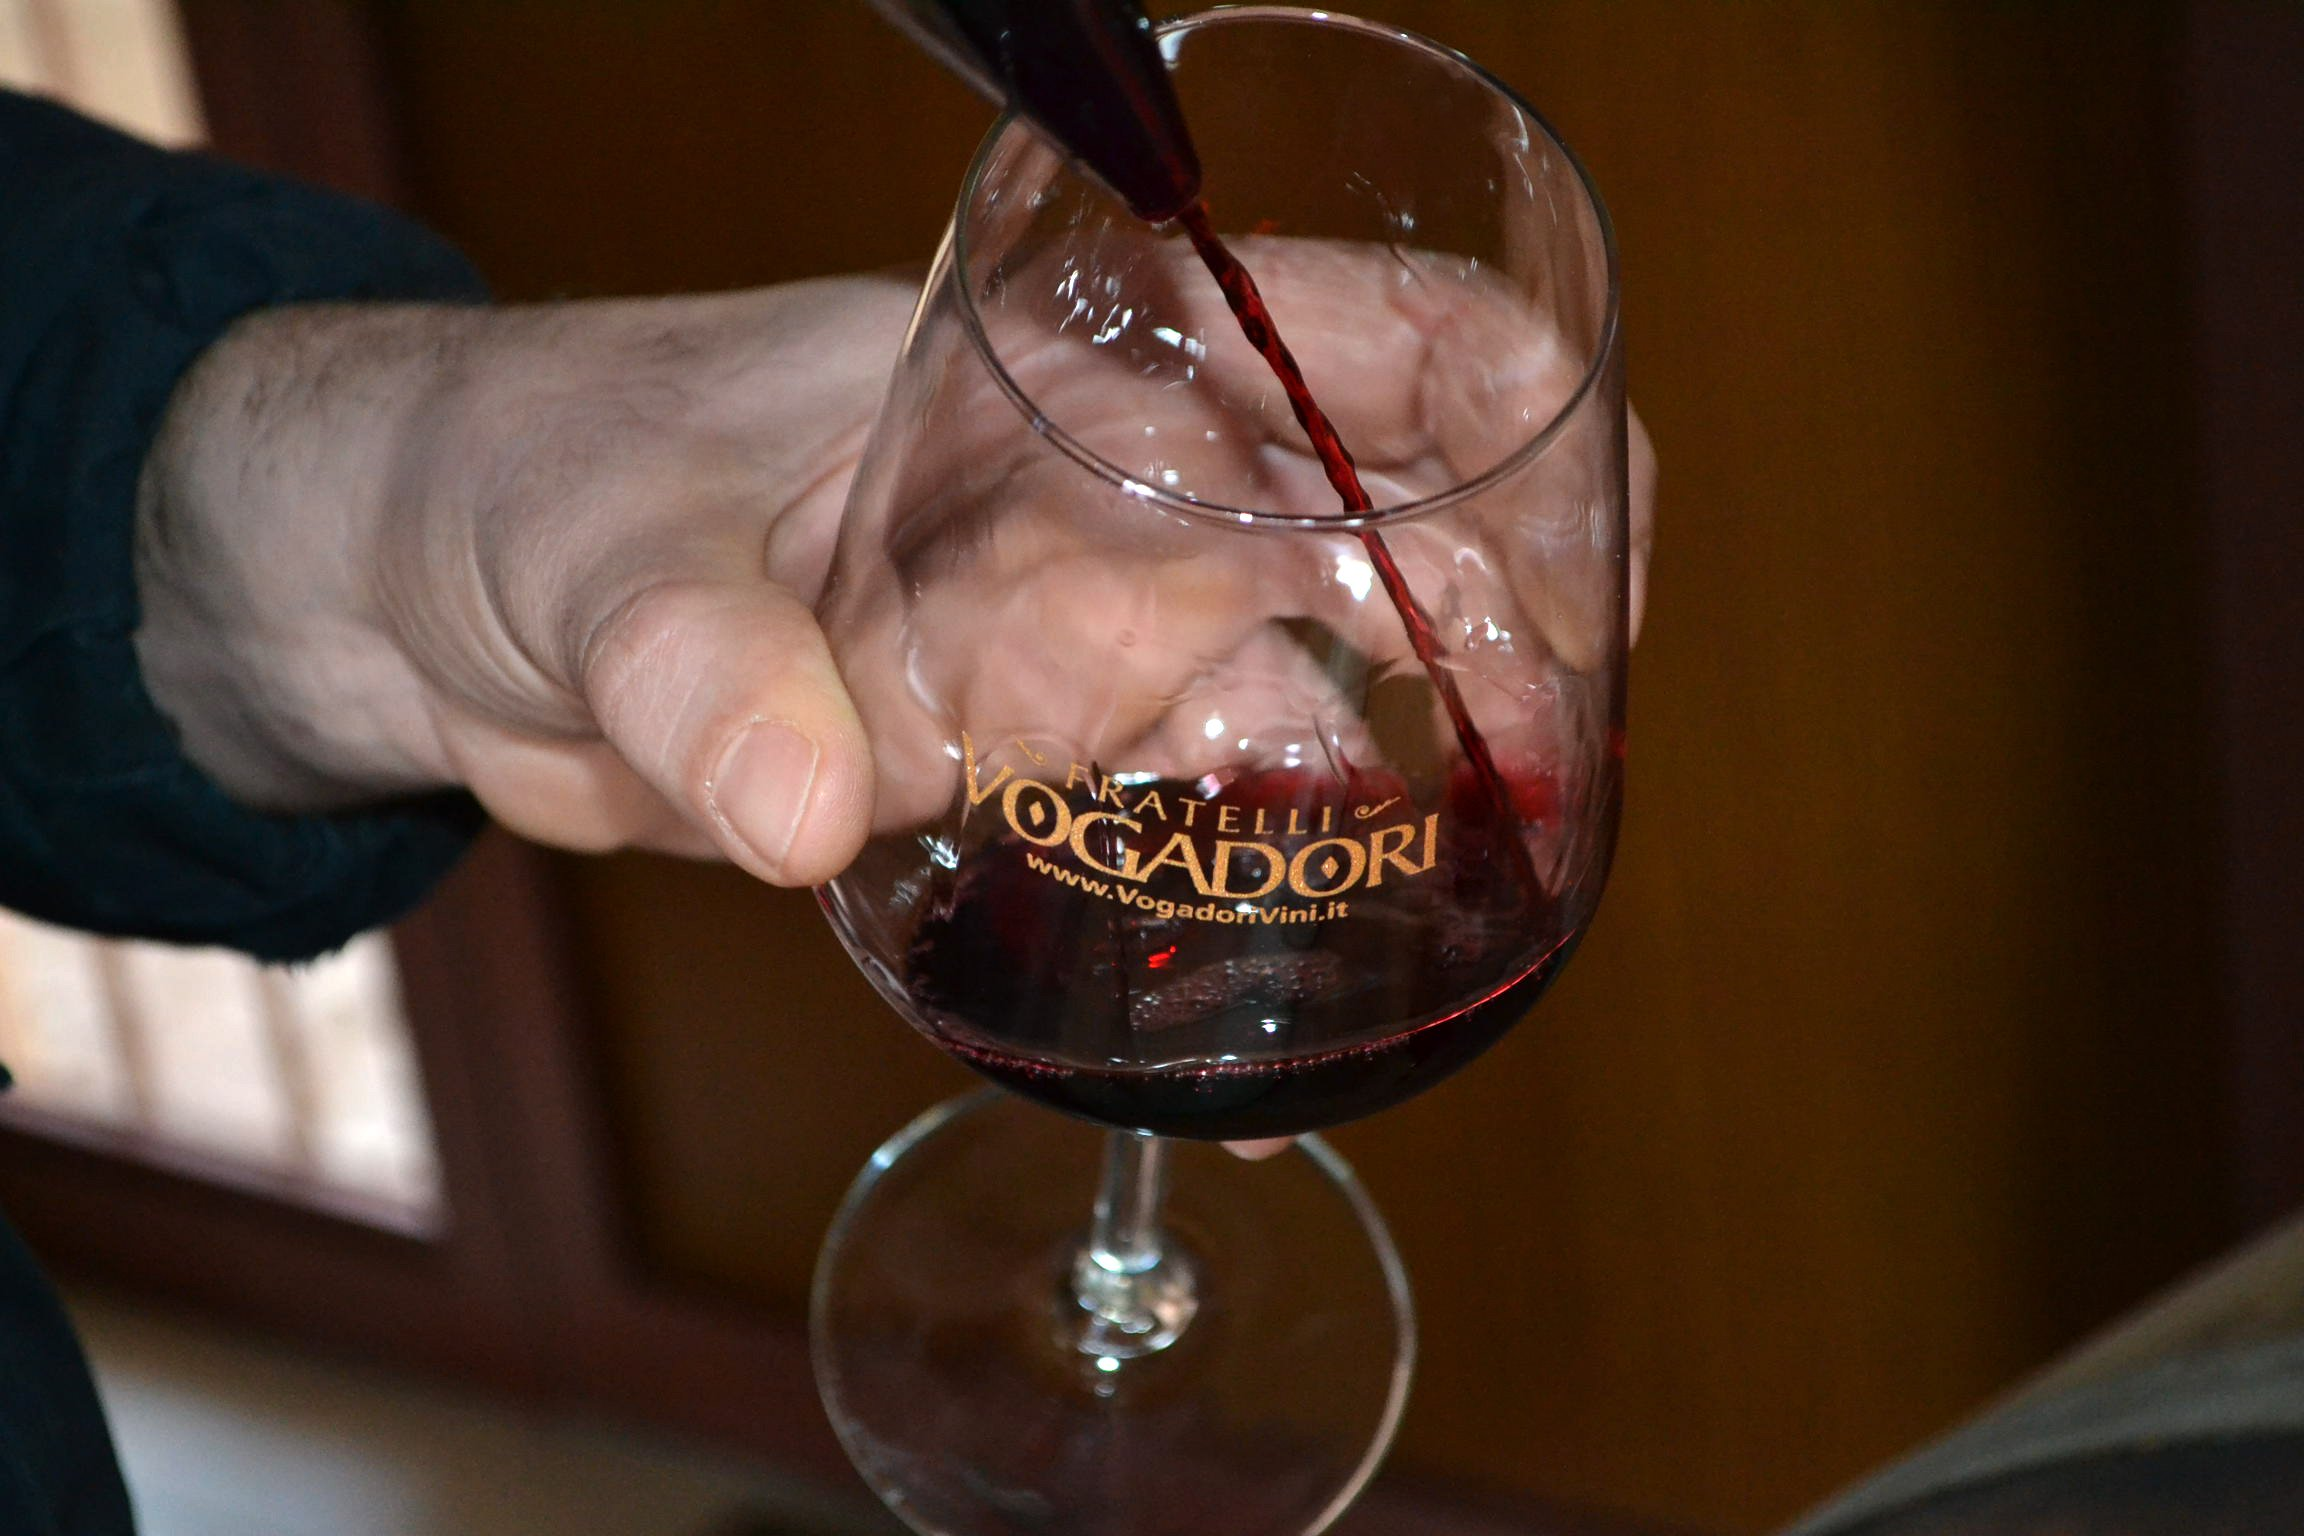 Valpolicella guided winetasting tasting